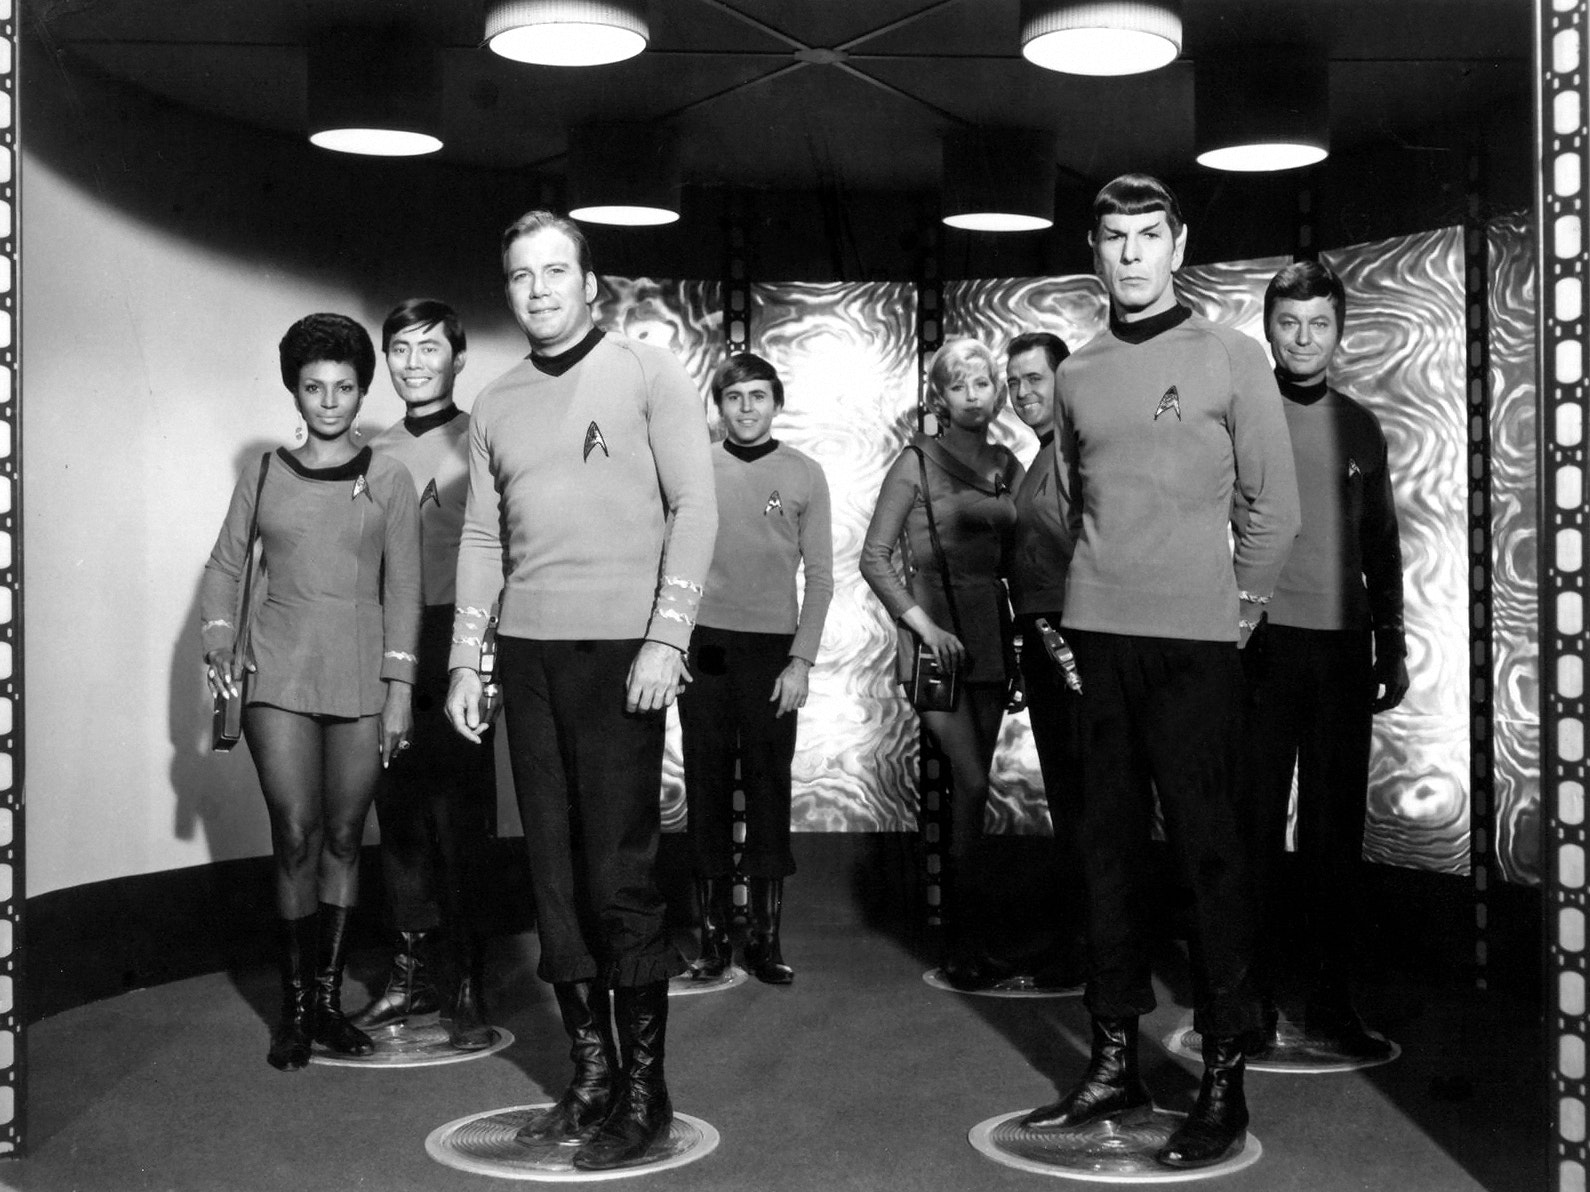 The 7 Biggest 'Star Trek' Myths, Debunked